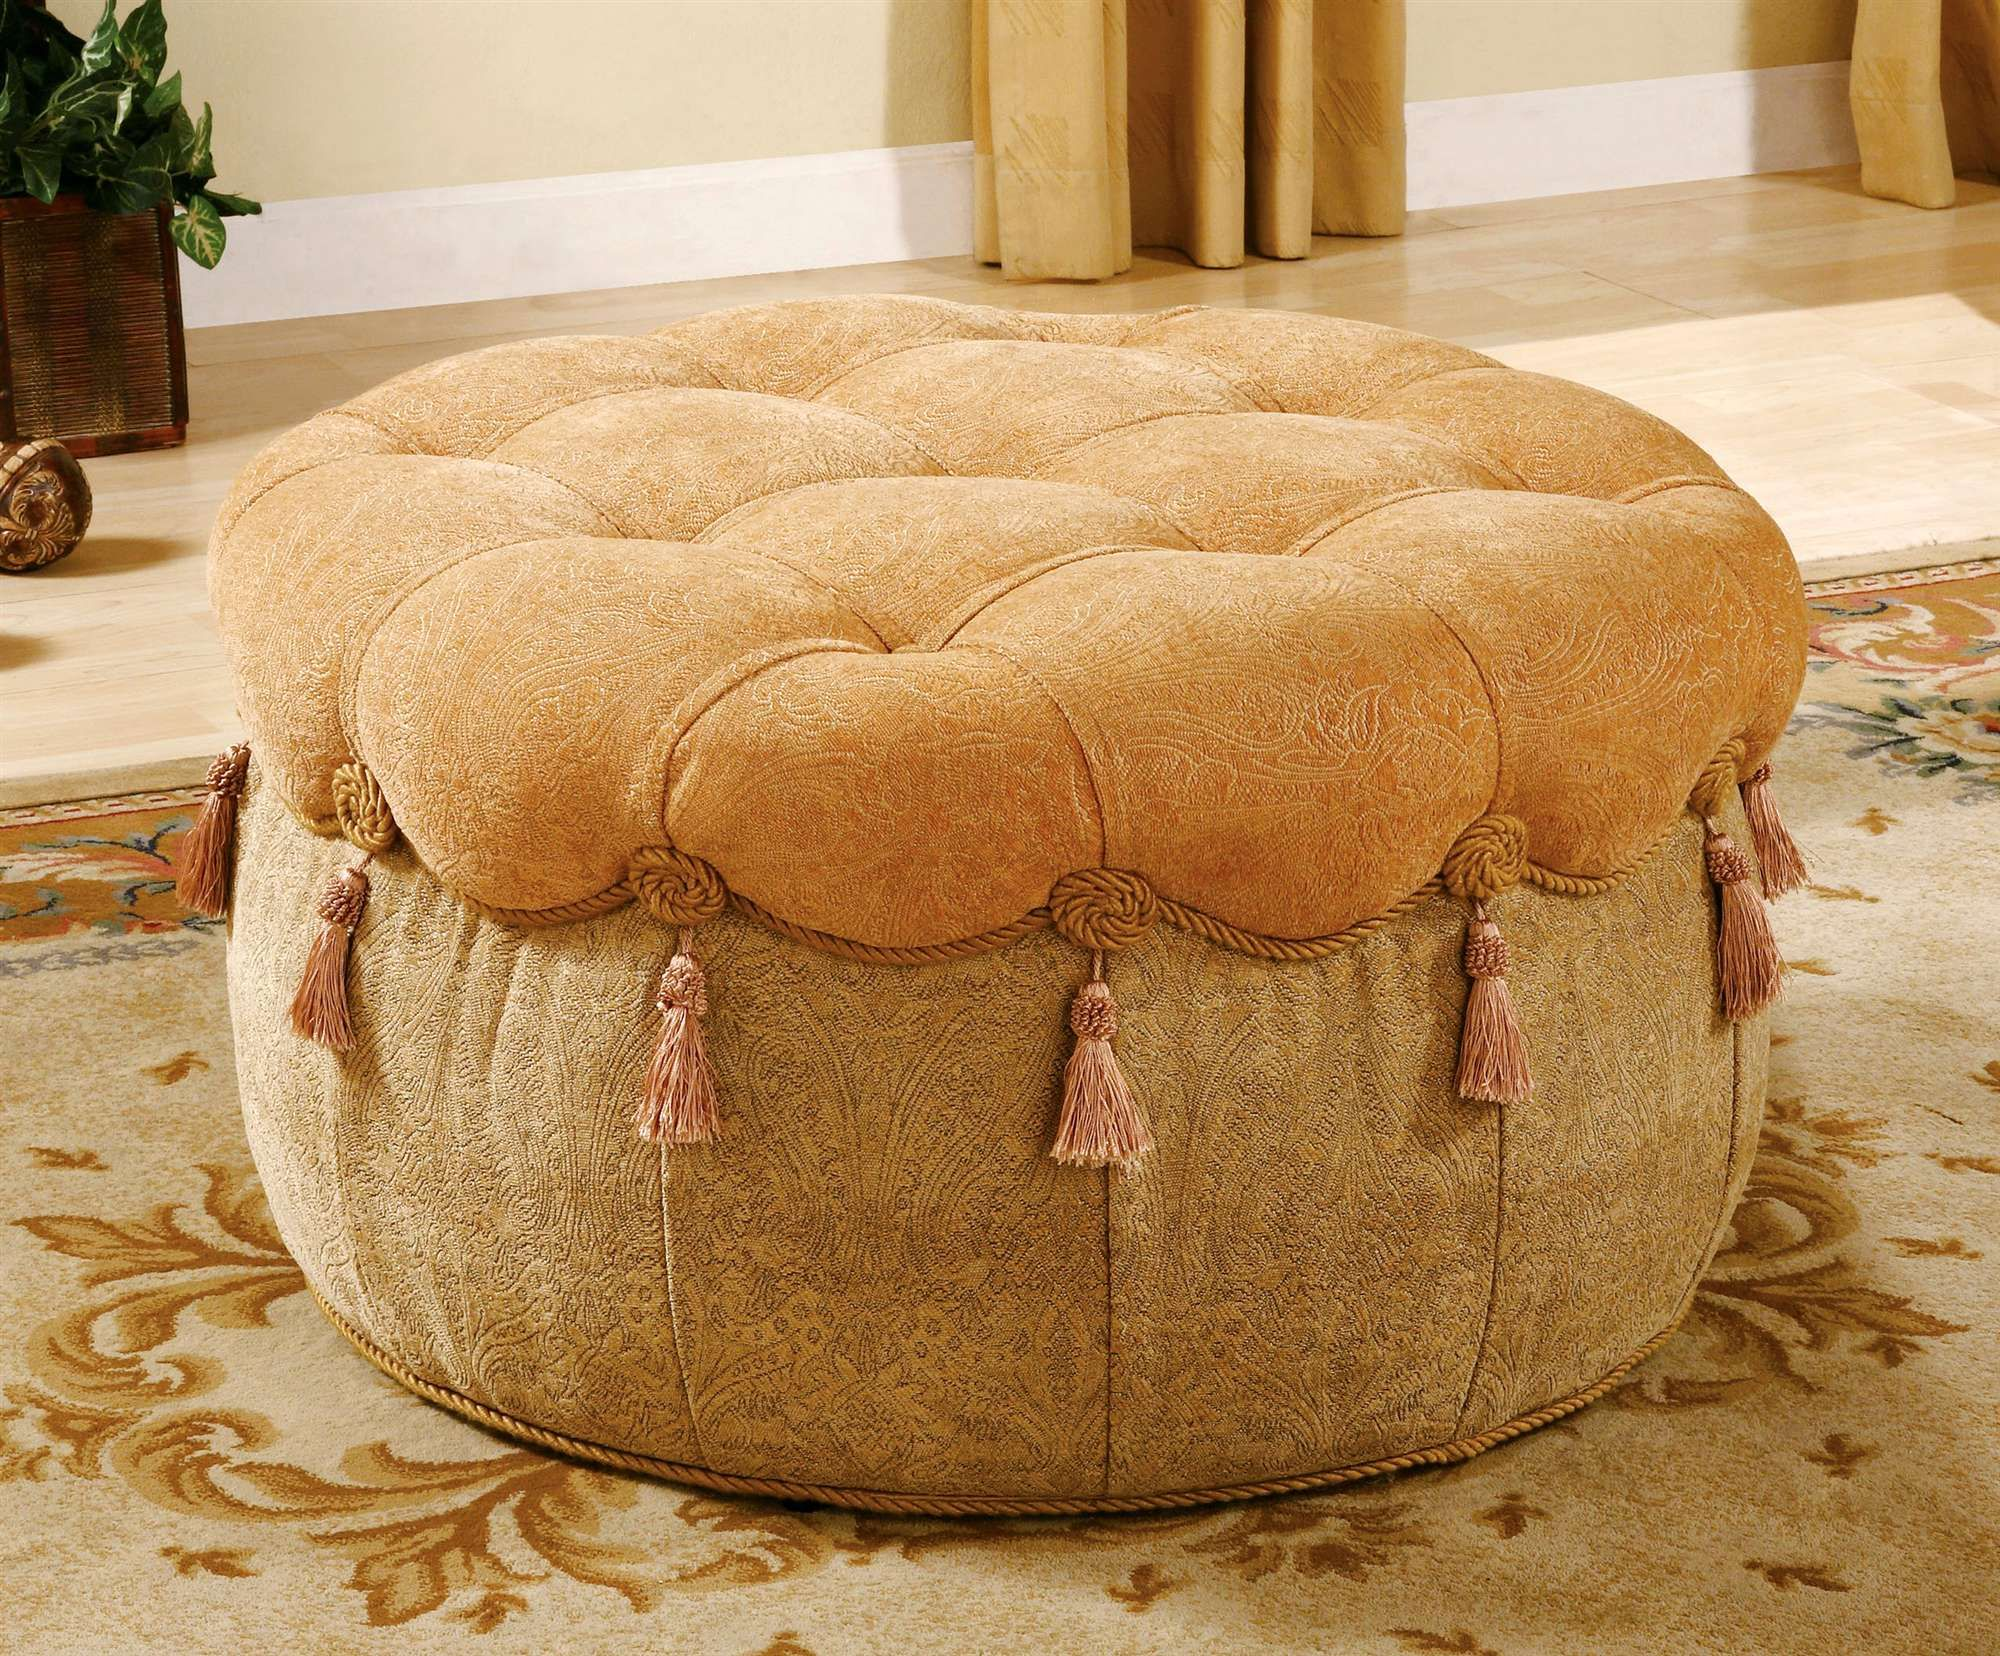 Marvelous Elegant Ottomans Photo Of Elegant Round Ottoman In Beige Ibusinesslaw Wood Chair Design Ideas Ibusinesslaworg